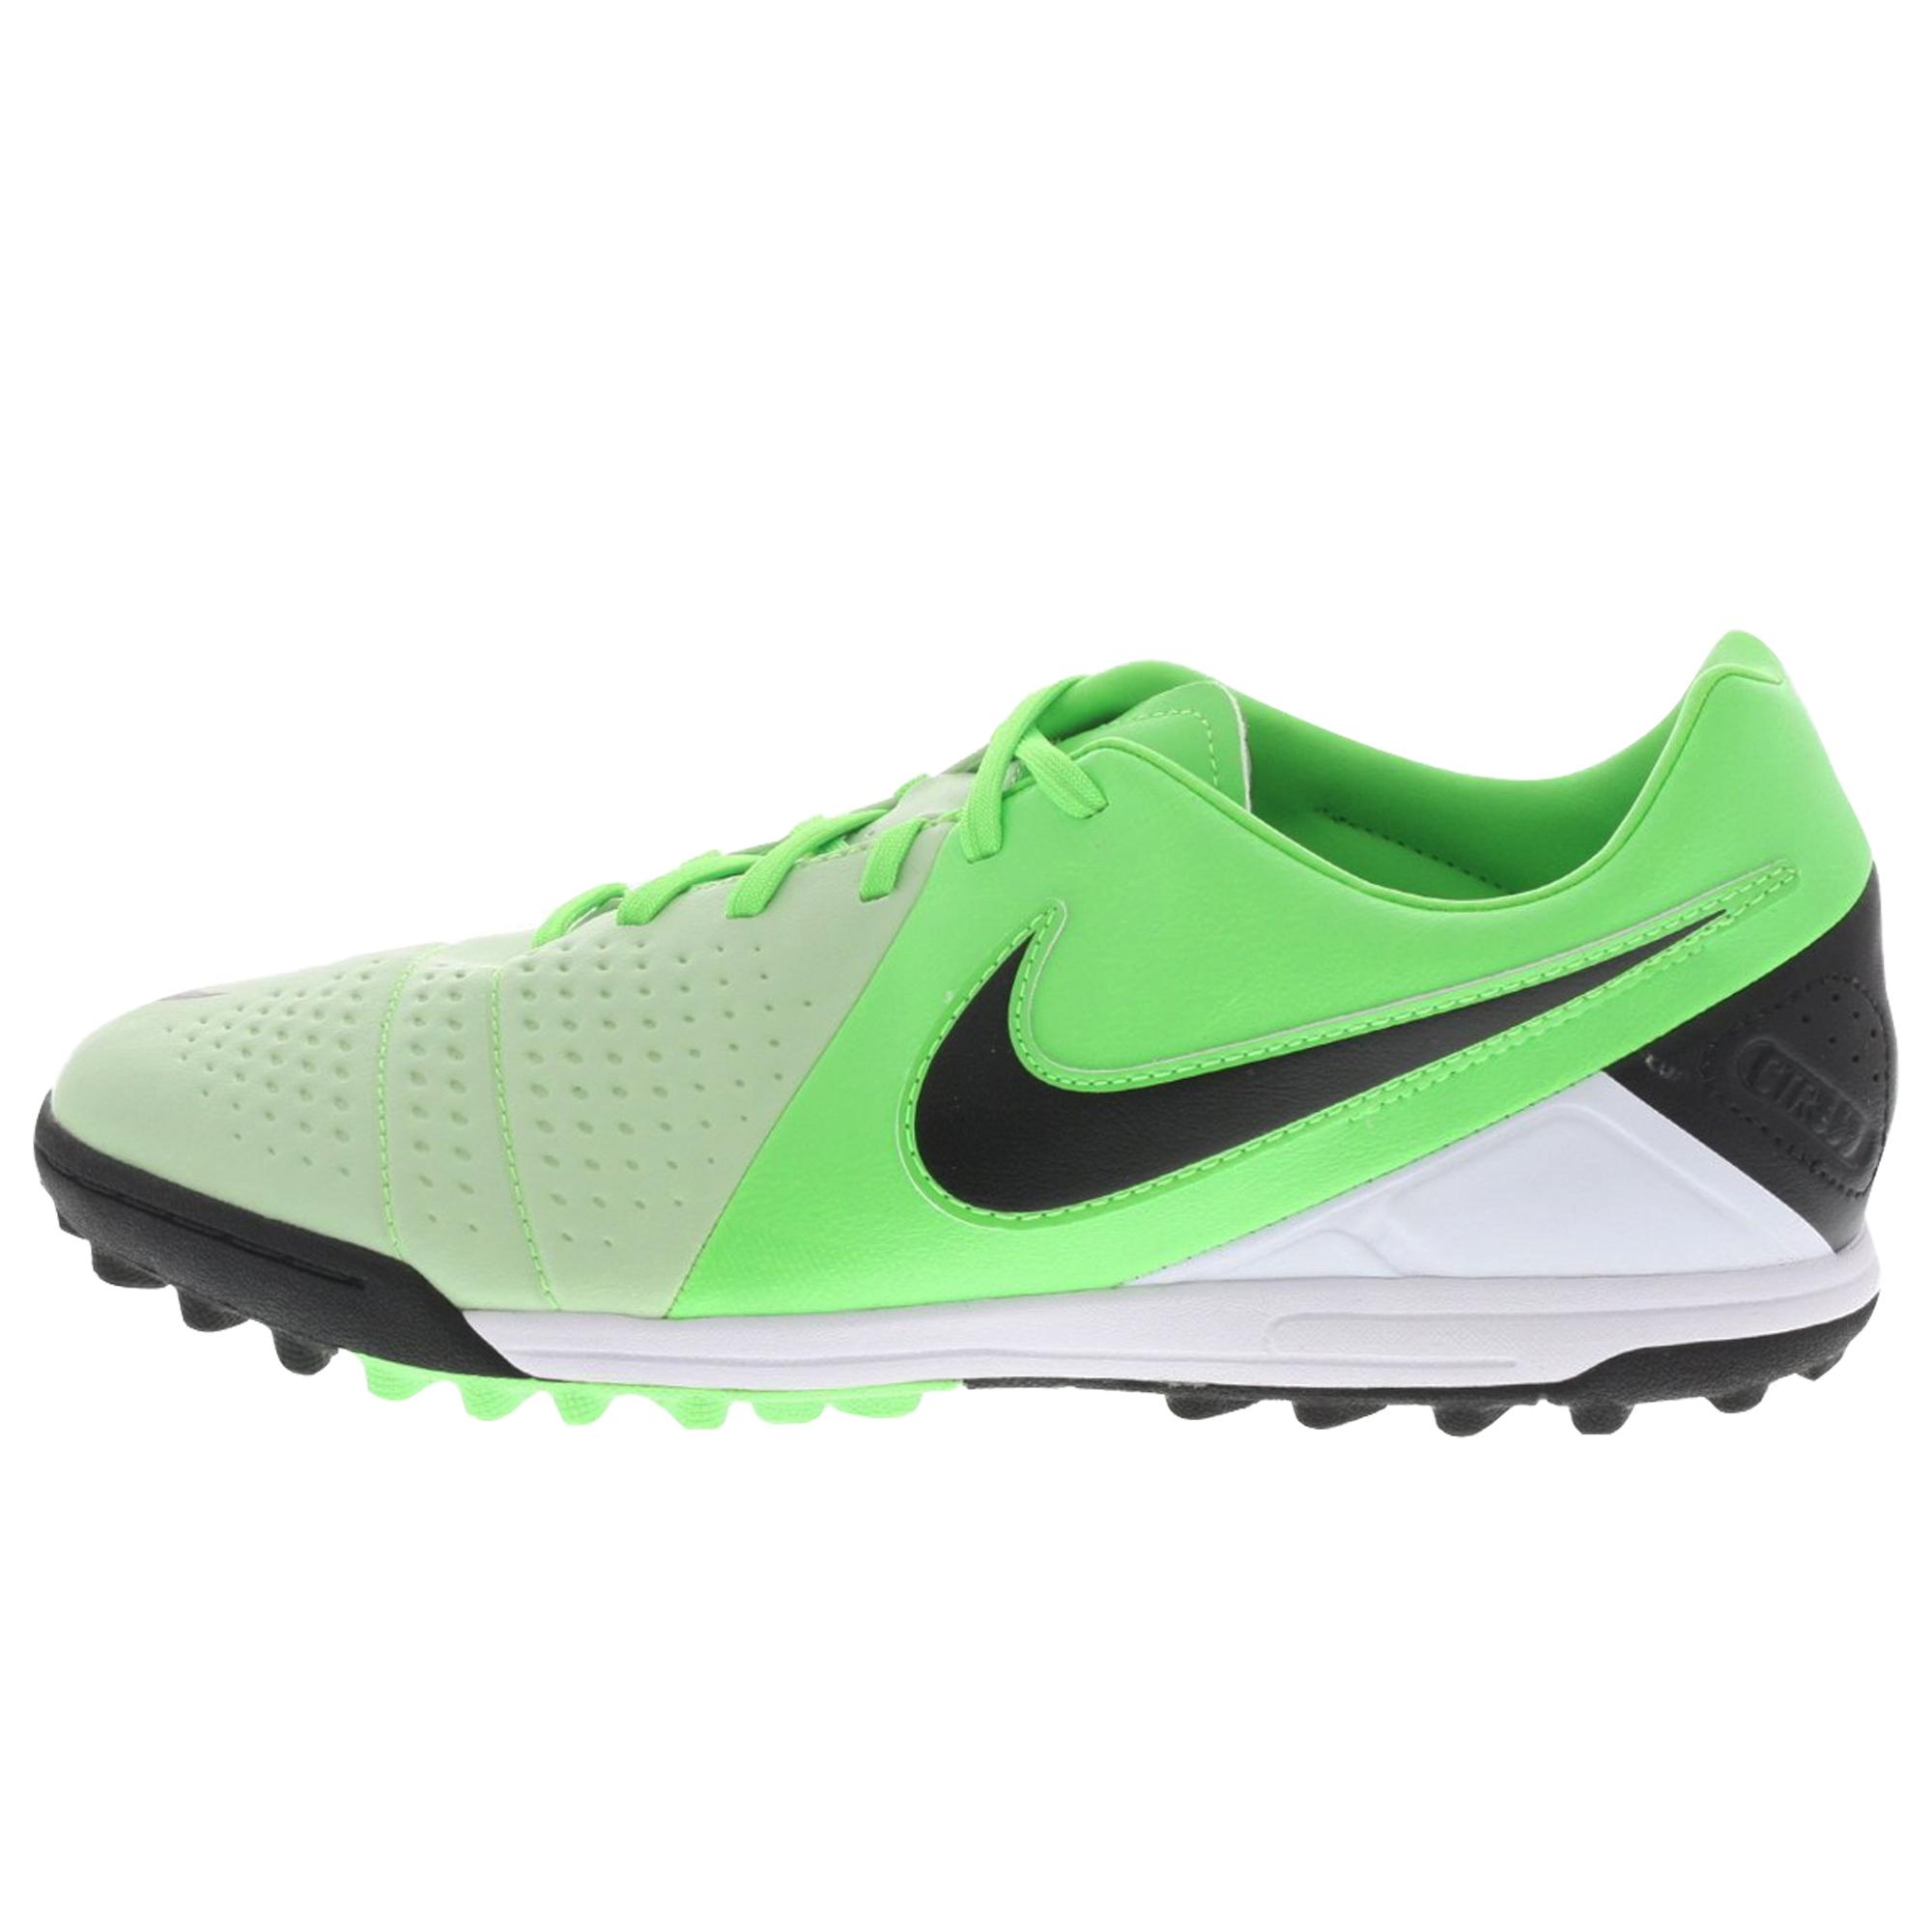 online retailer fcfc7 cc77e Nike Ctr 360 Libretto III Tf FW13 Halı Saha Ayakkabısı